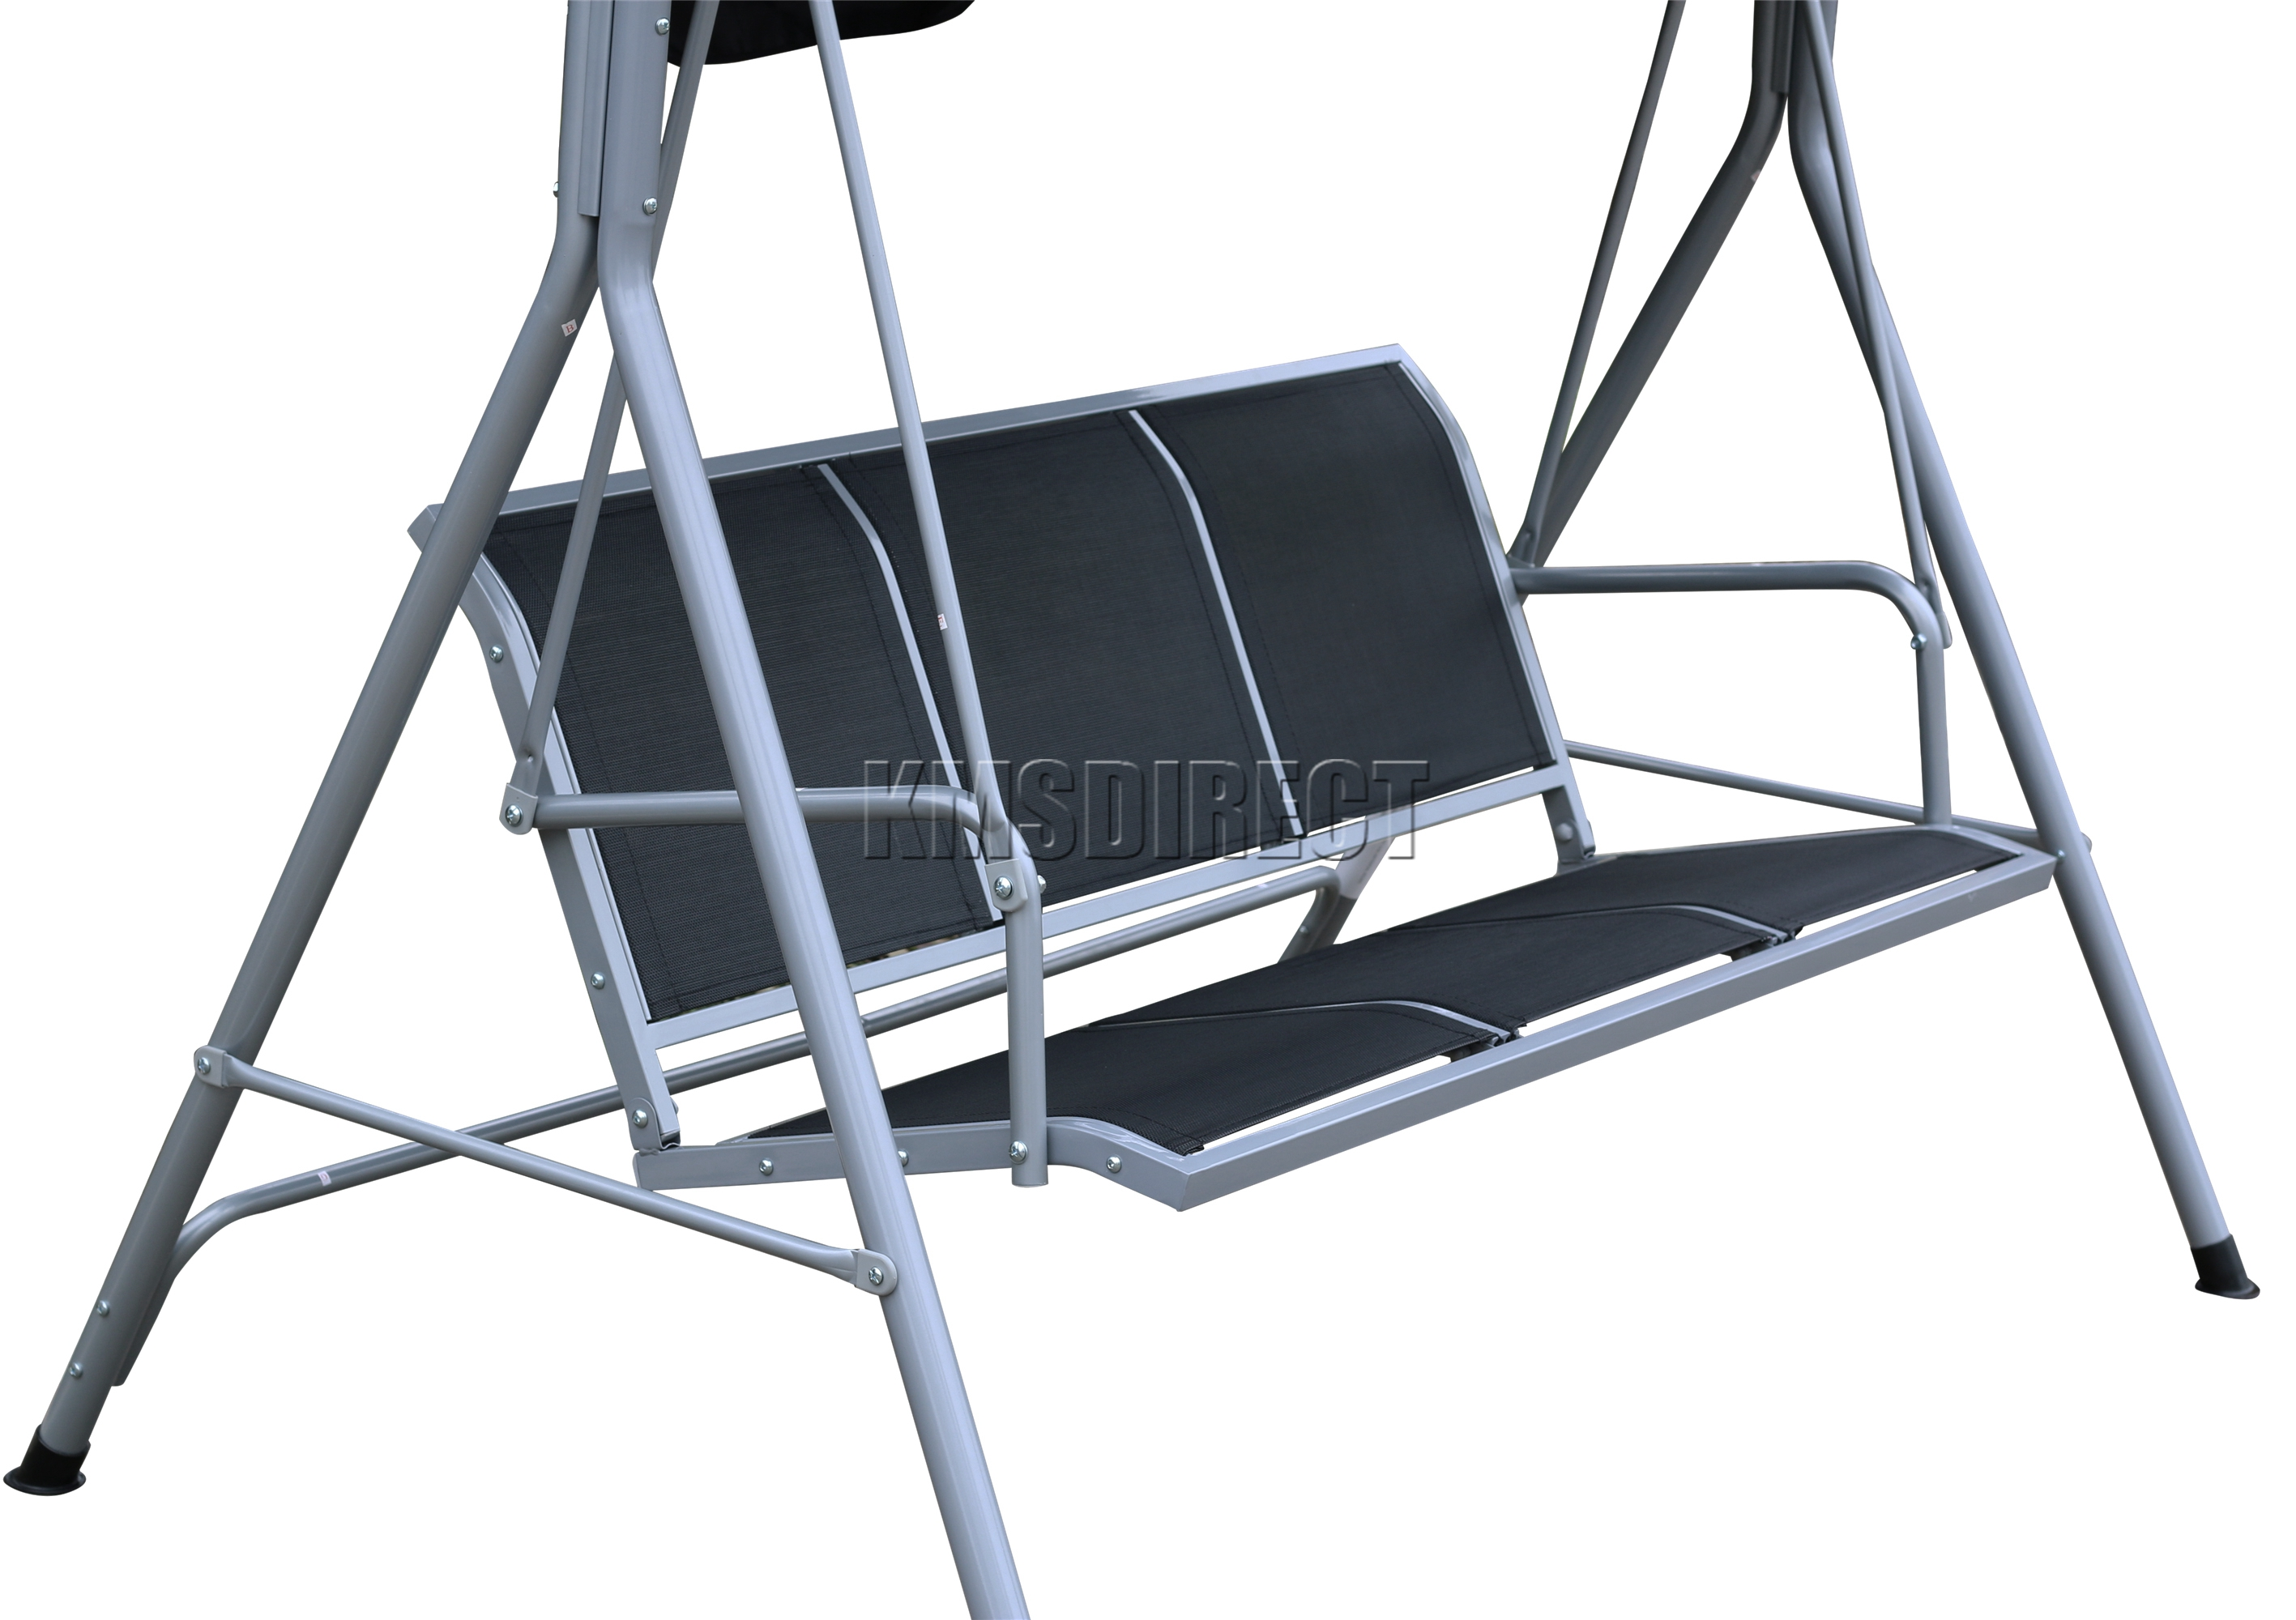 swing chair steel chicco high straps foxhunter garden metal hammock 3 seater bench